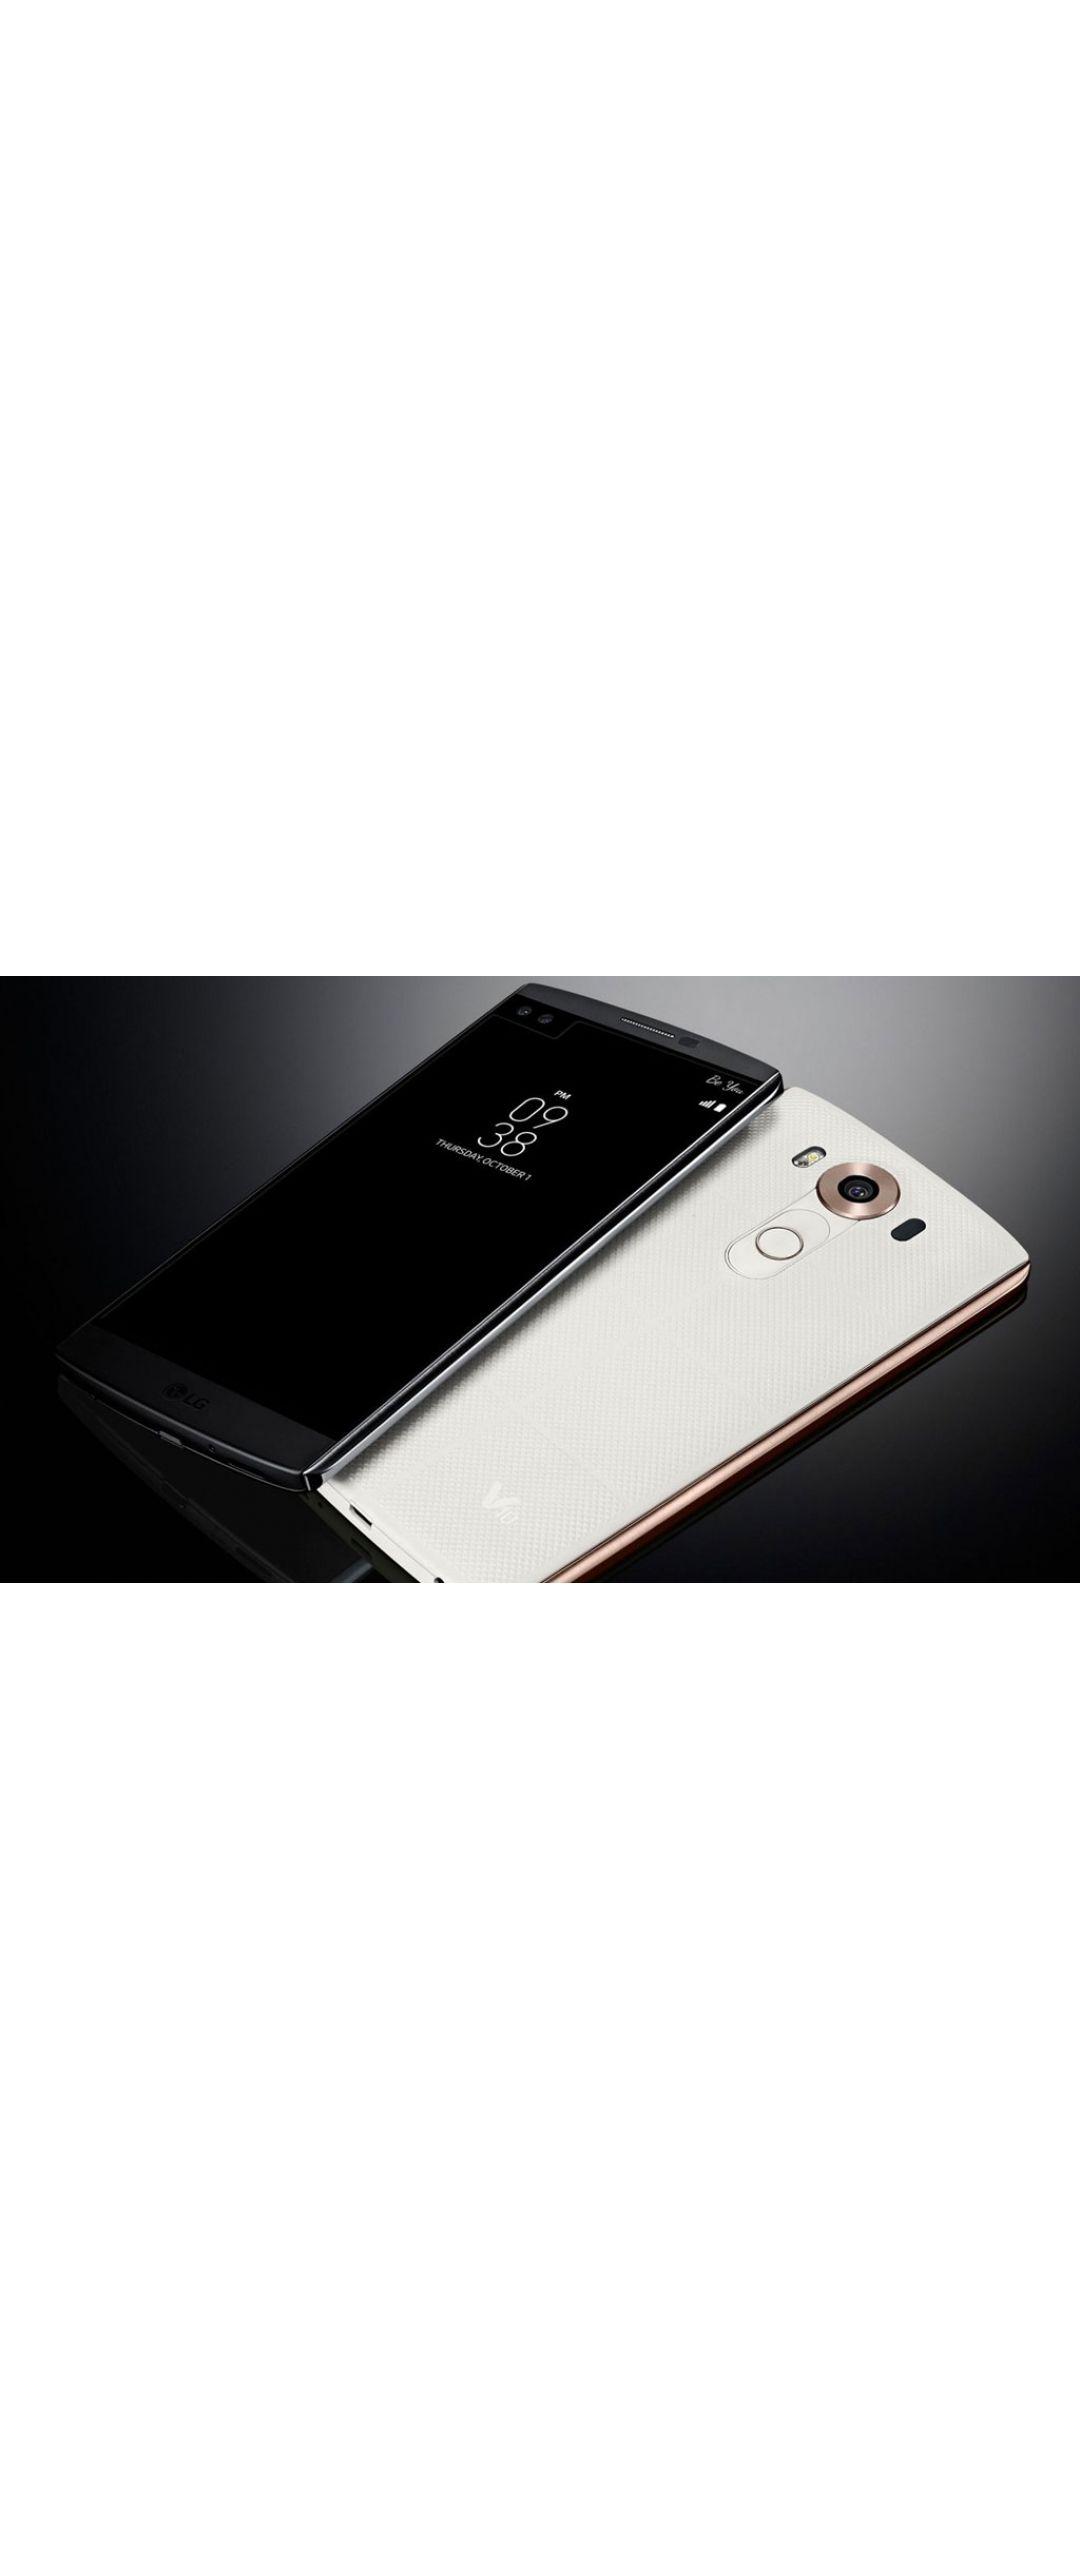 LG V20 ser� el primer smartphone del mundo con audio Quad DAC